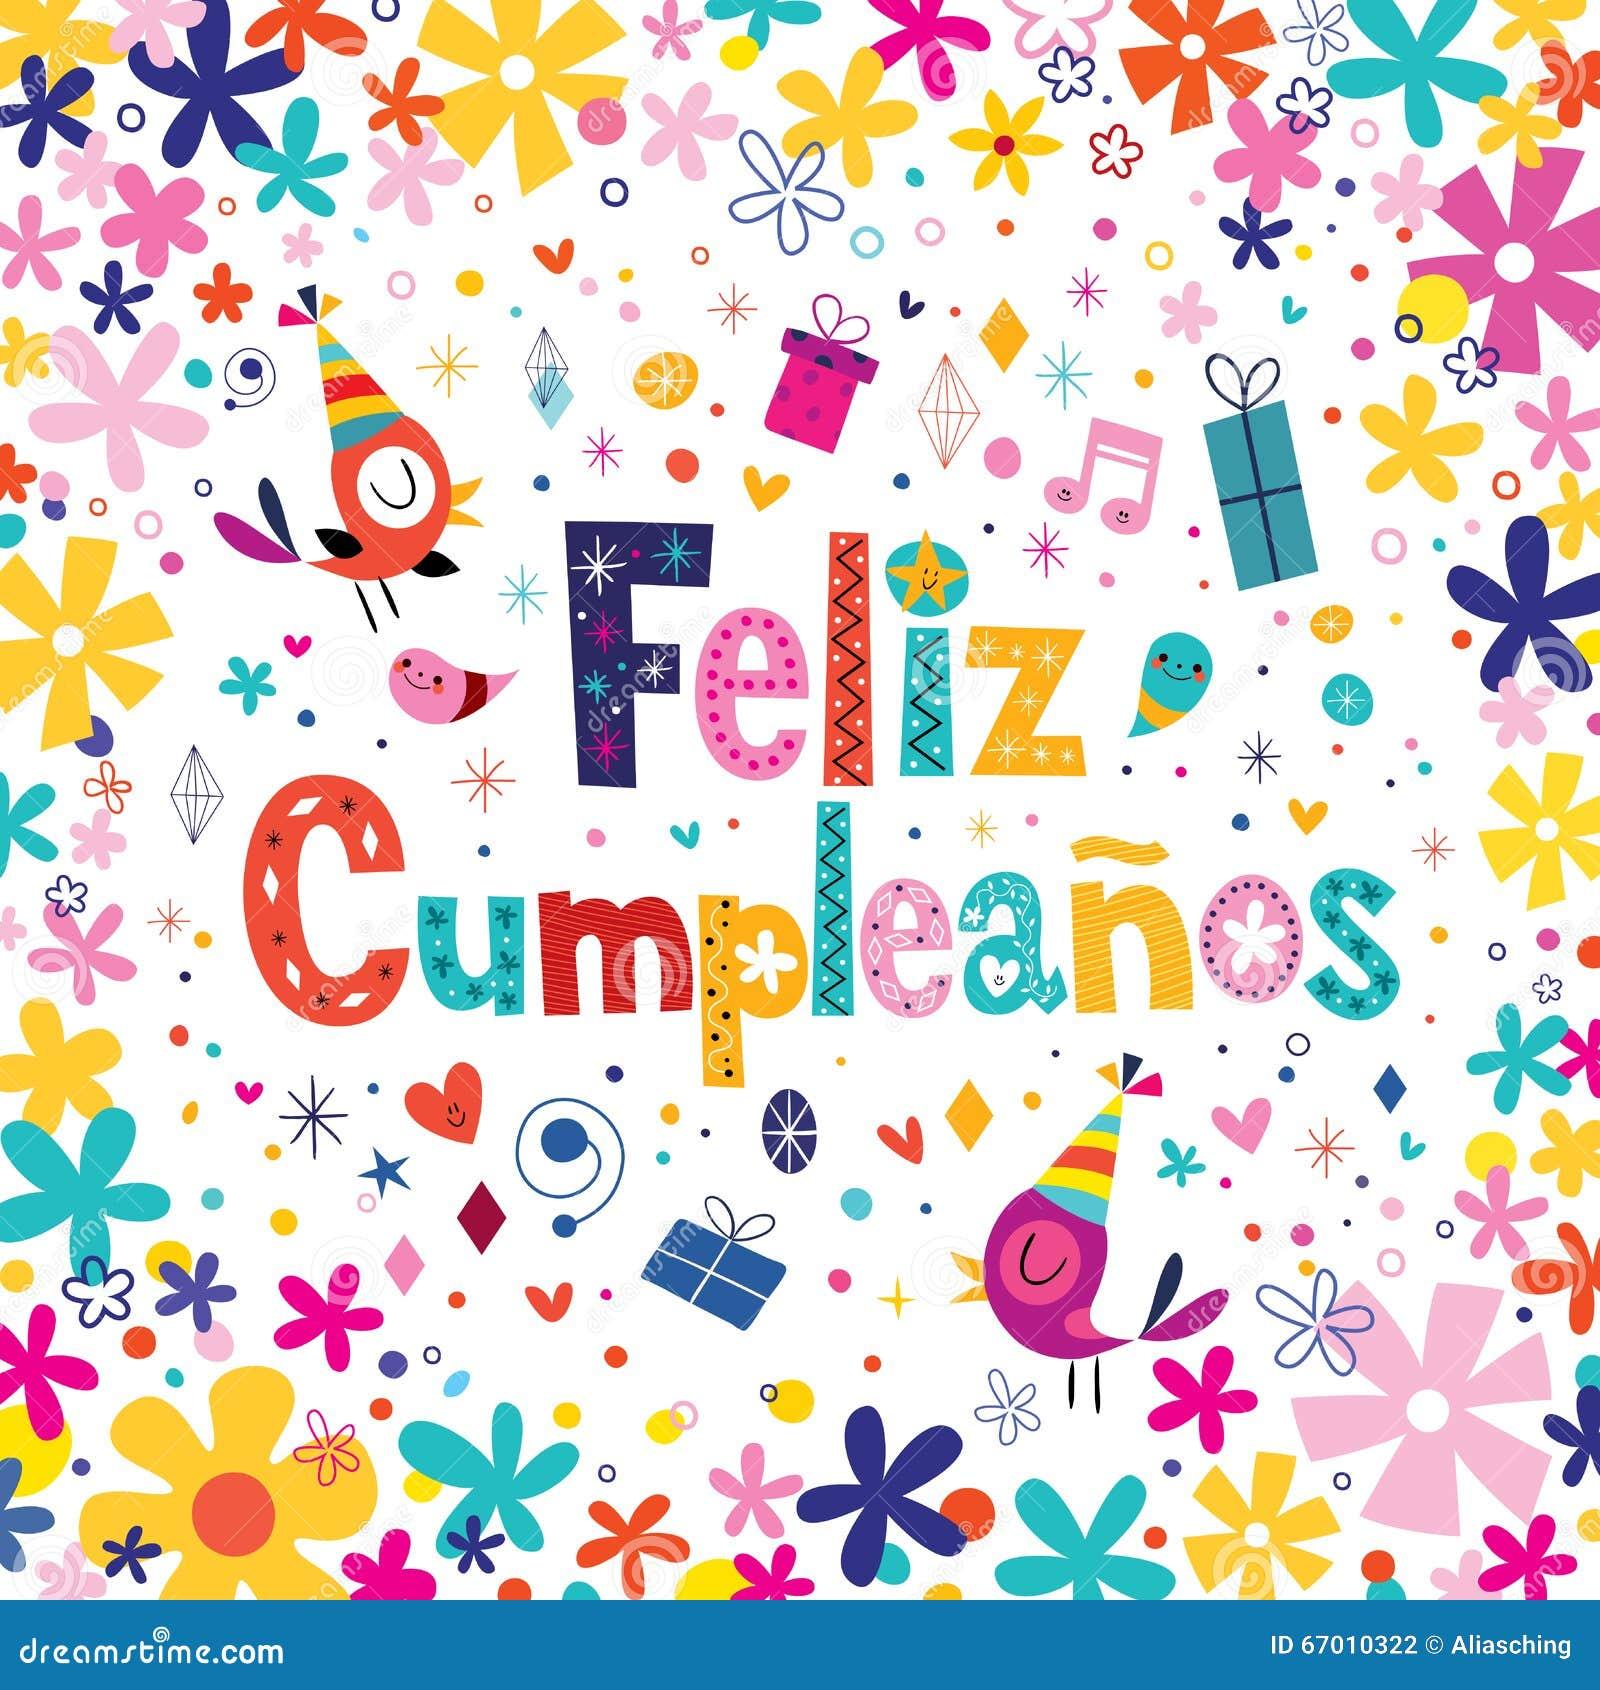 Feliz Cumpleanos Happy Birthday In Spanish Greeting Card Stock Vector Image 67010322